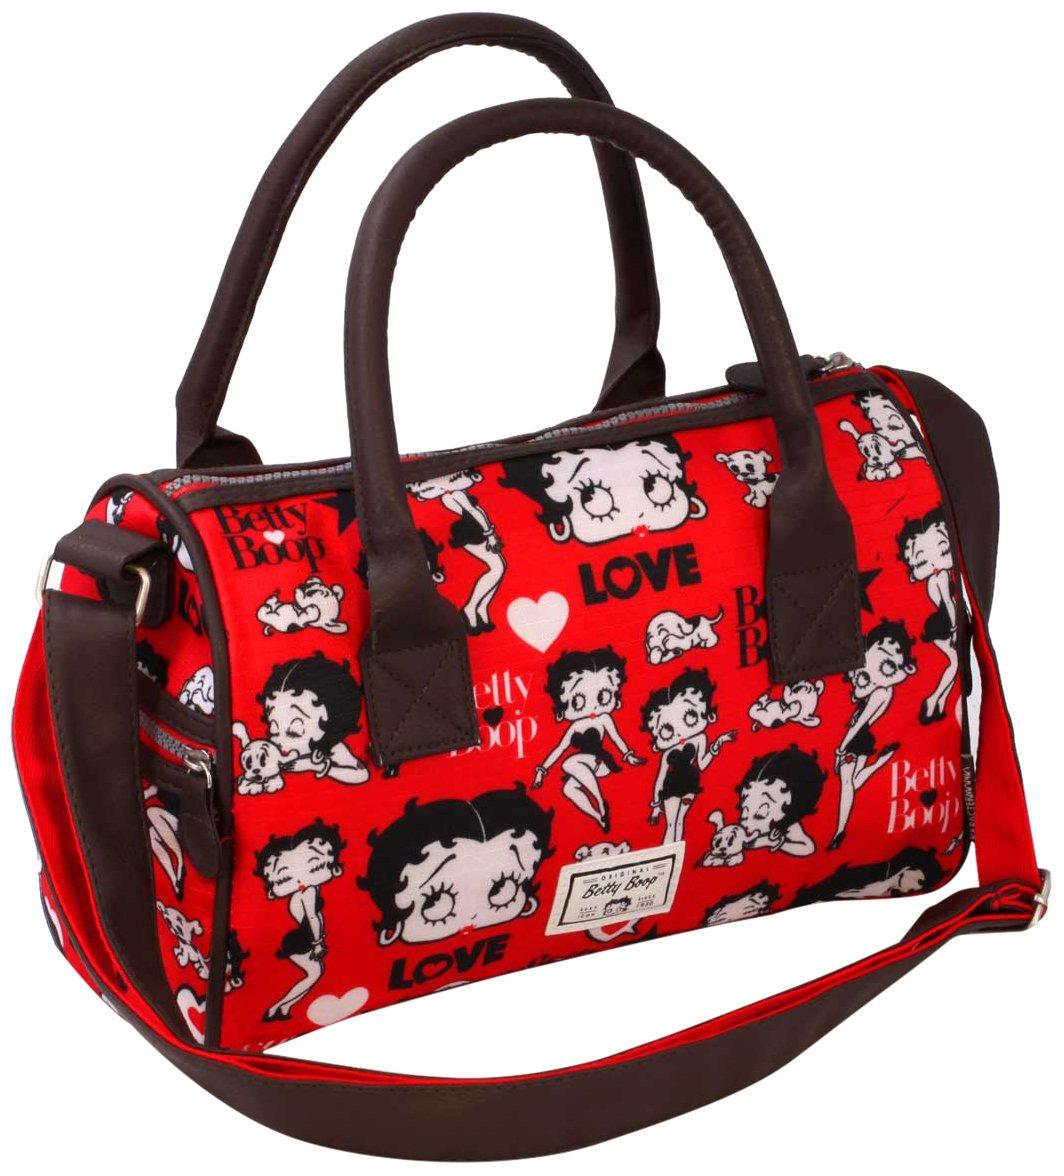 Betty Boop Rouge Messenger Bag, 31 cm, Red (Rojo) 36499